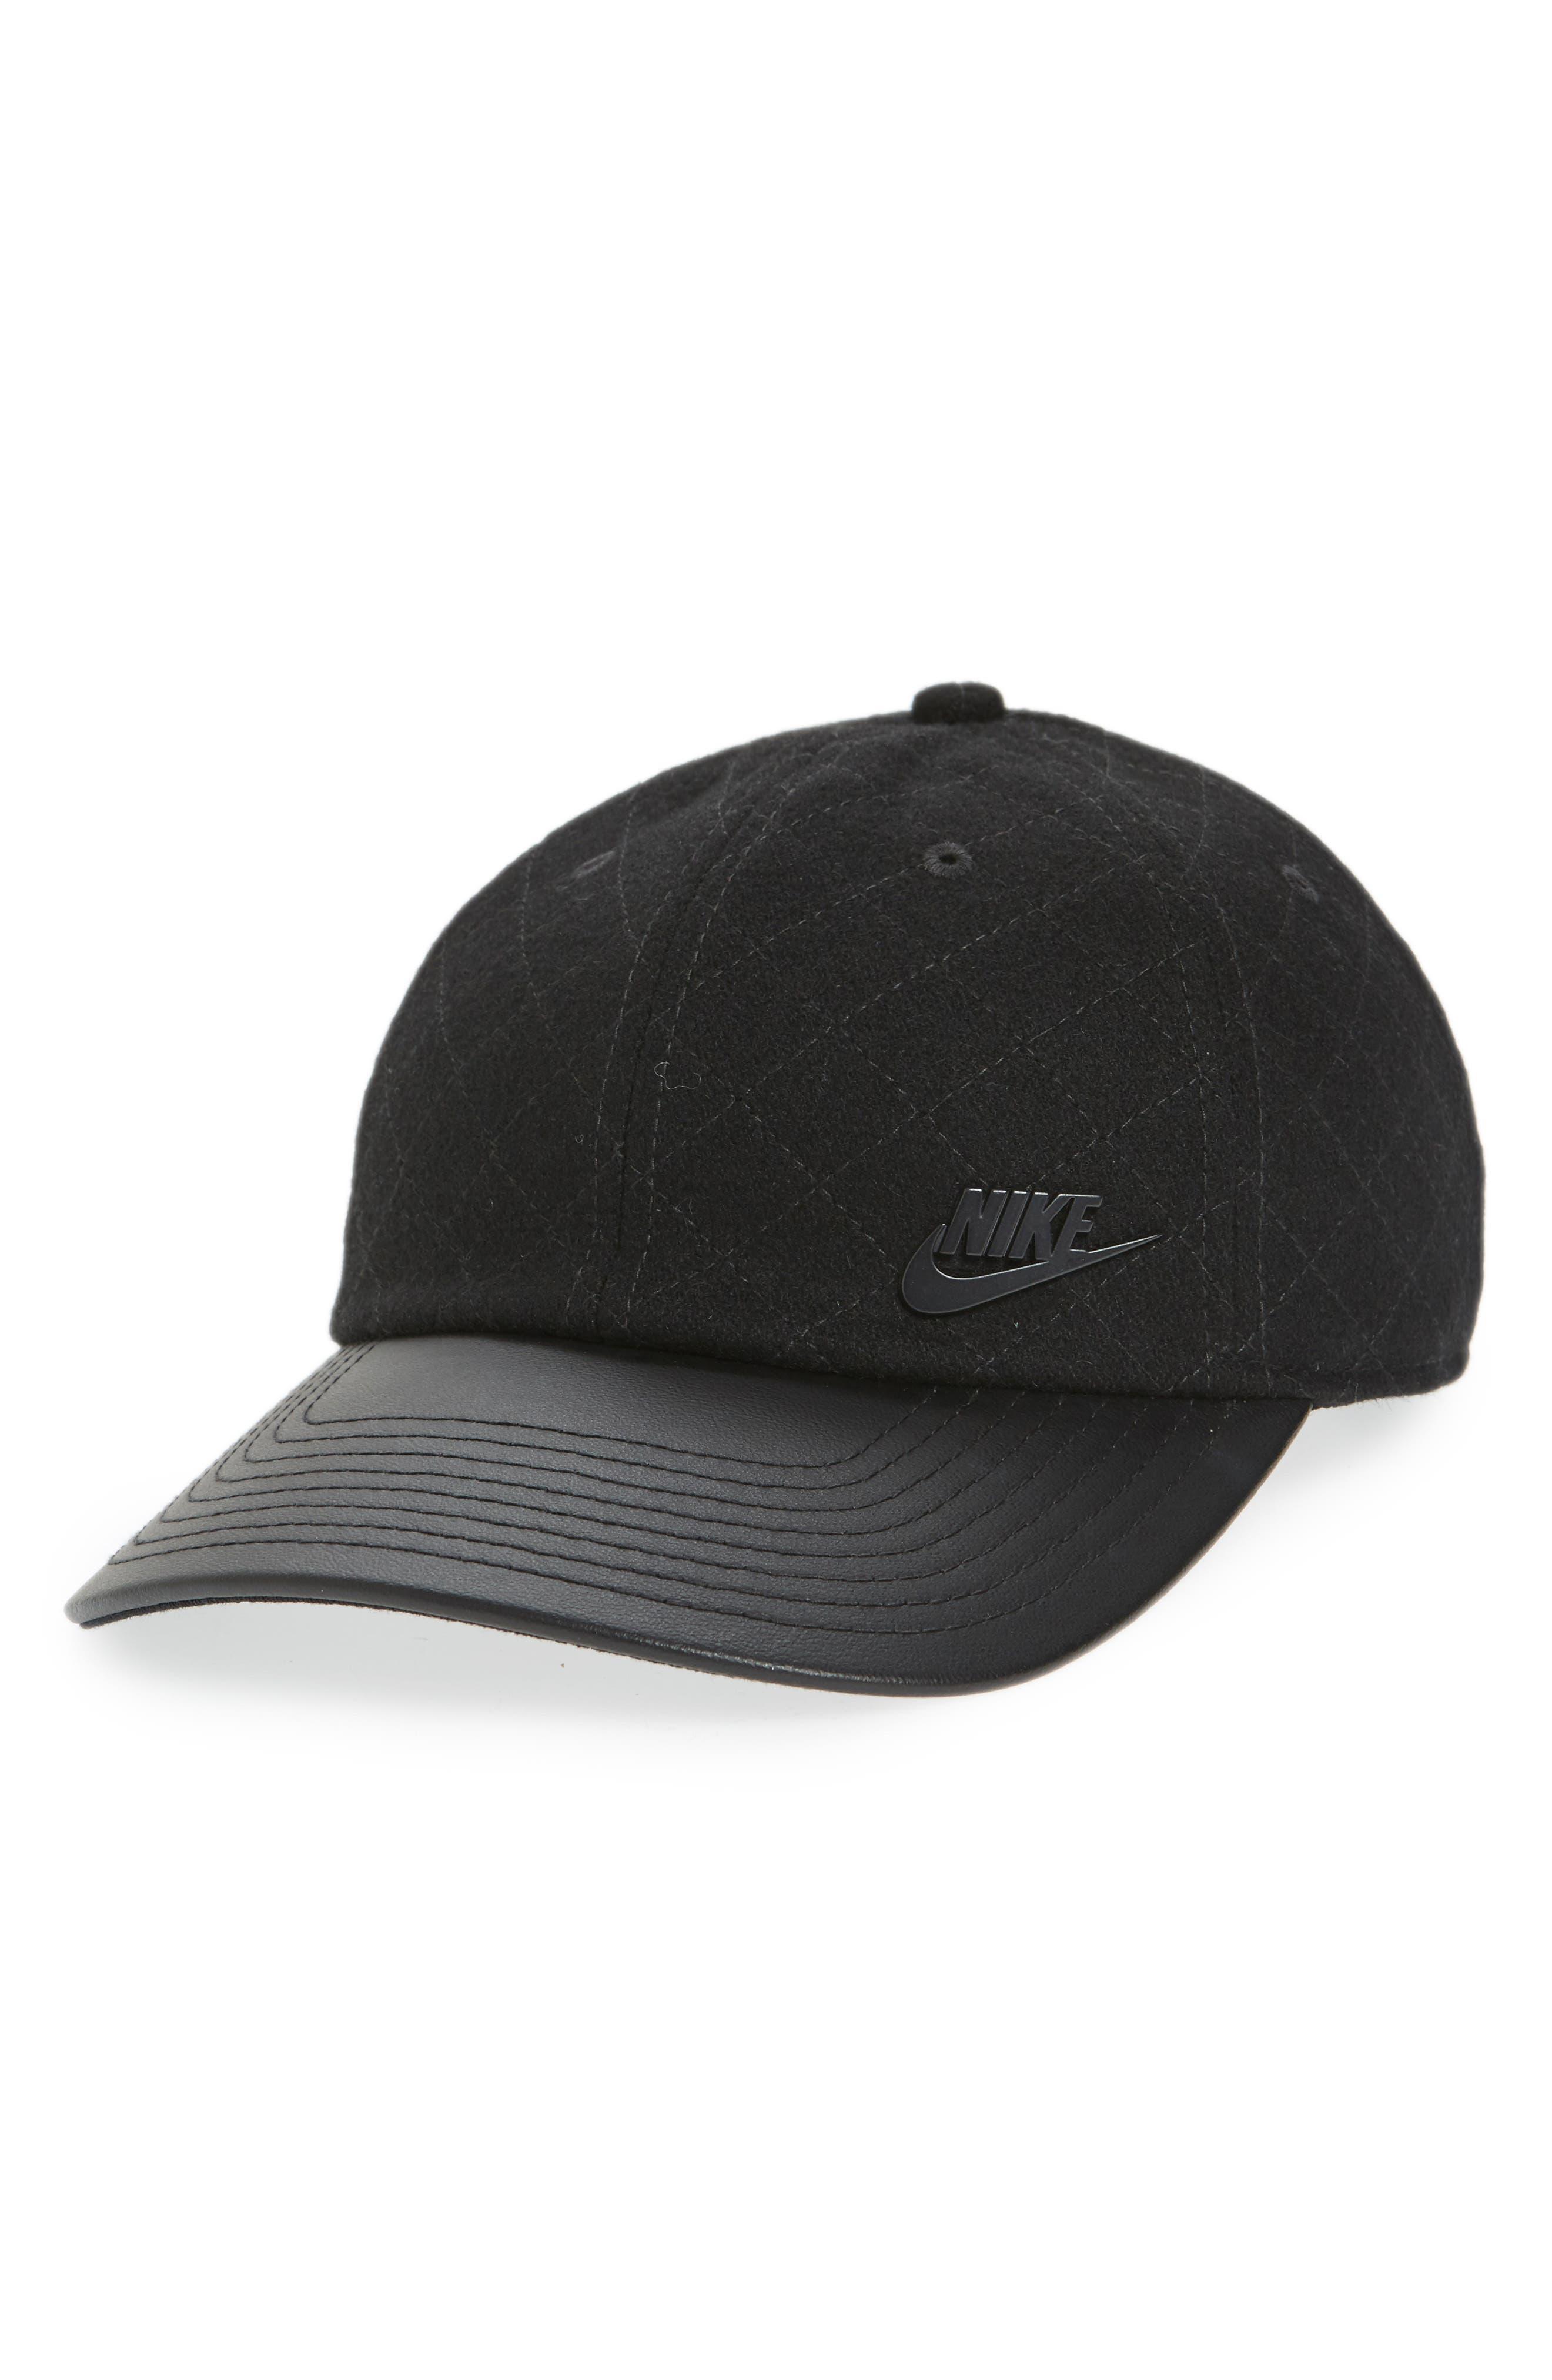 Main Image - Nike Sportswear H86 Cap